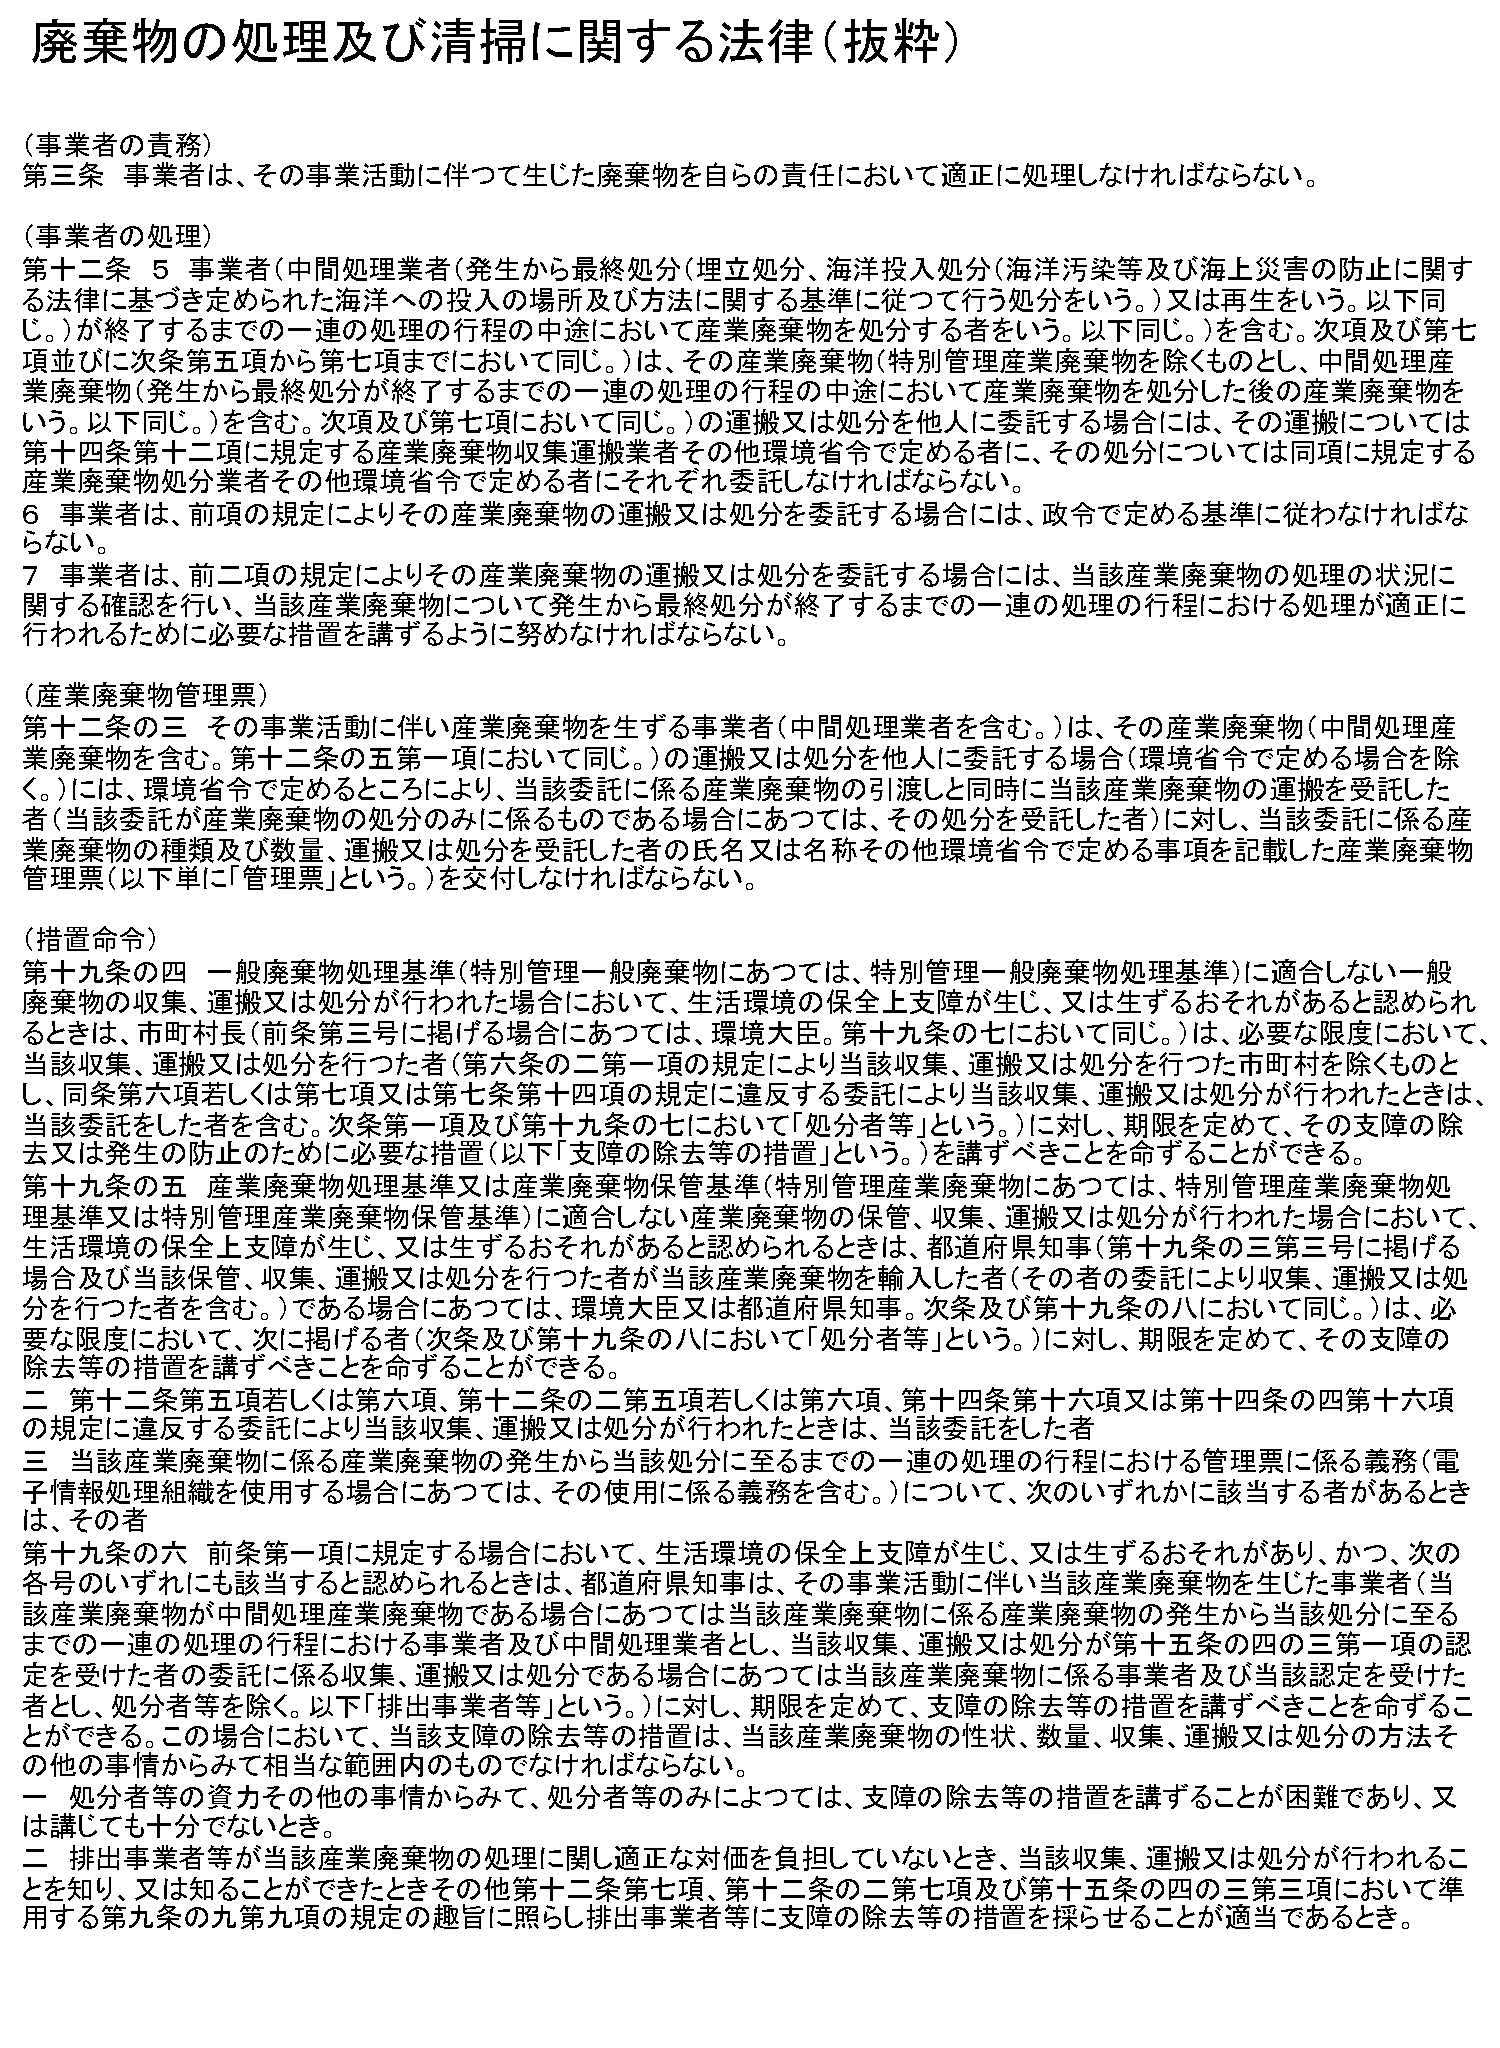 paper_20200122_02_2